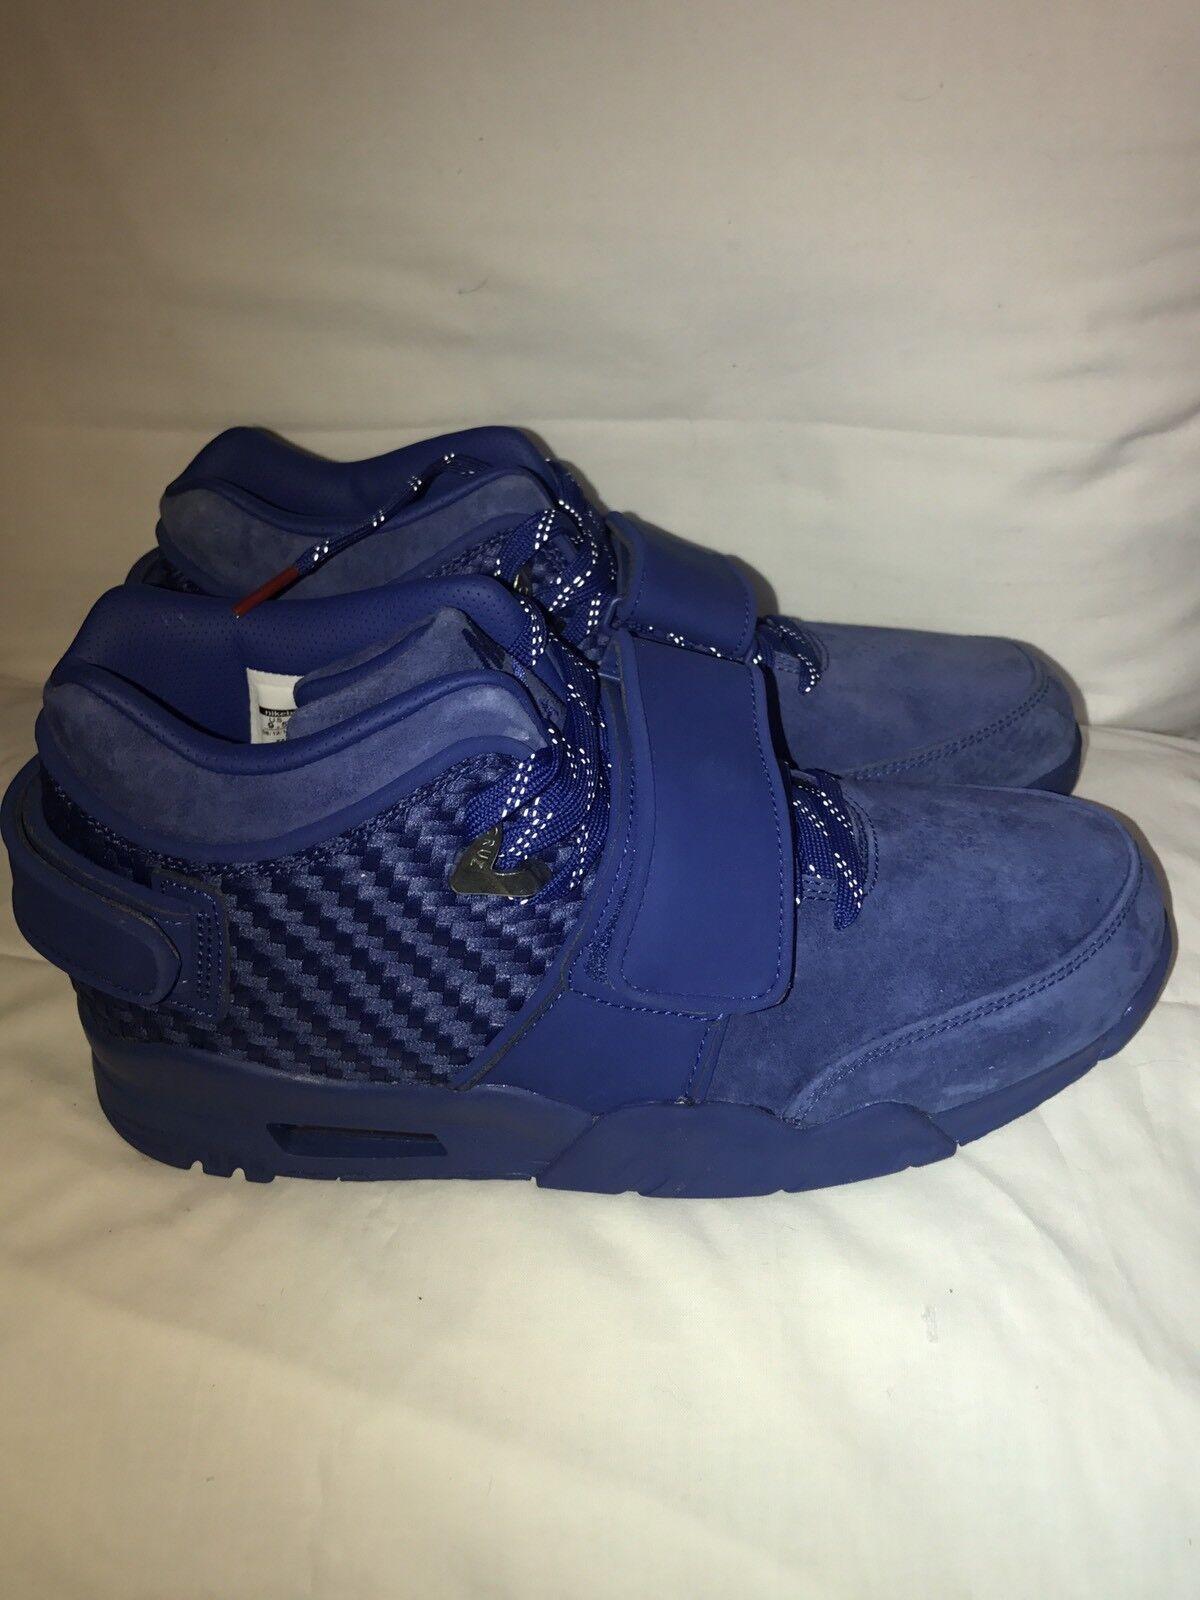 Nike Air Trainer Cruz Premium Blue Size 9.5 BRAND NEW 100%AUTHENTIC W/ RECIEPT